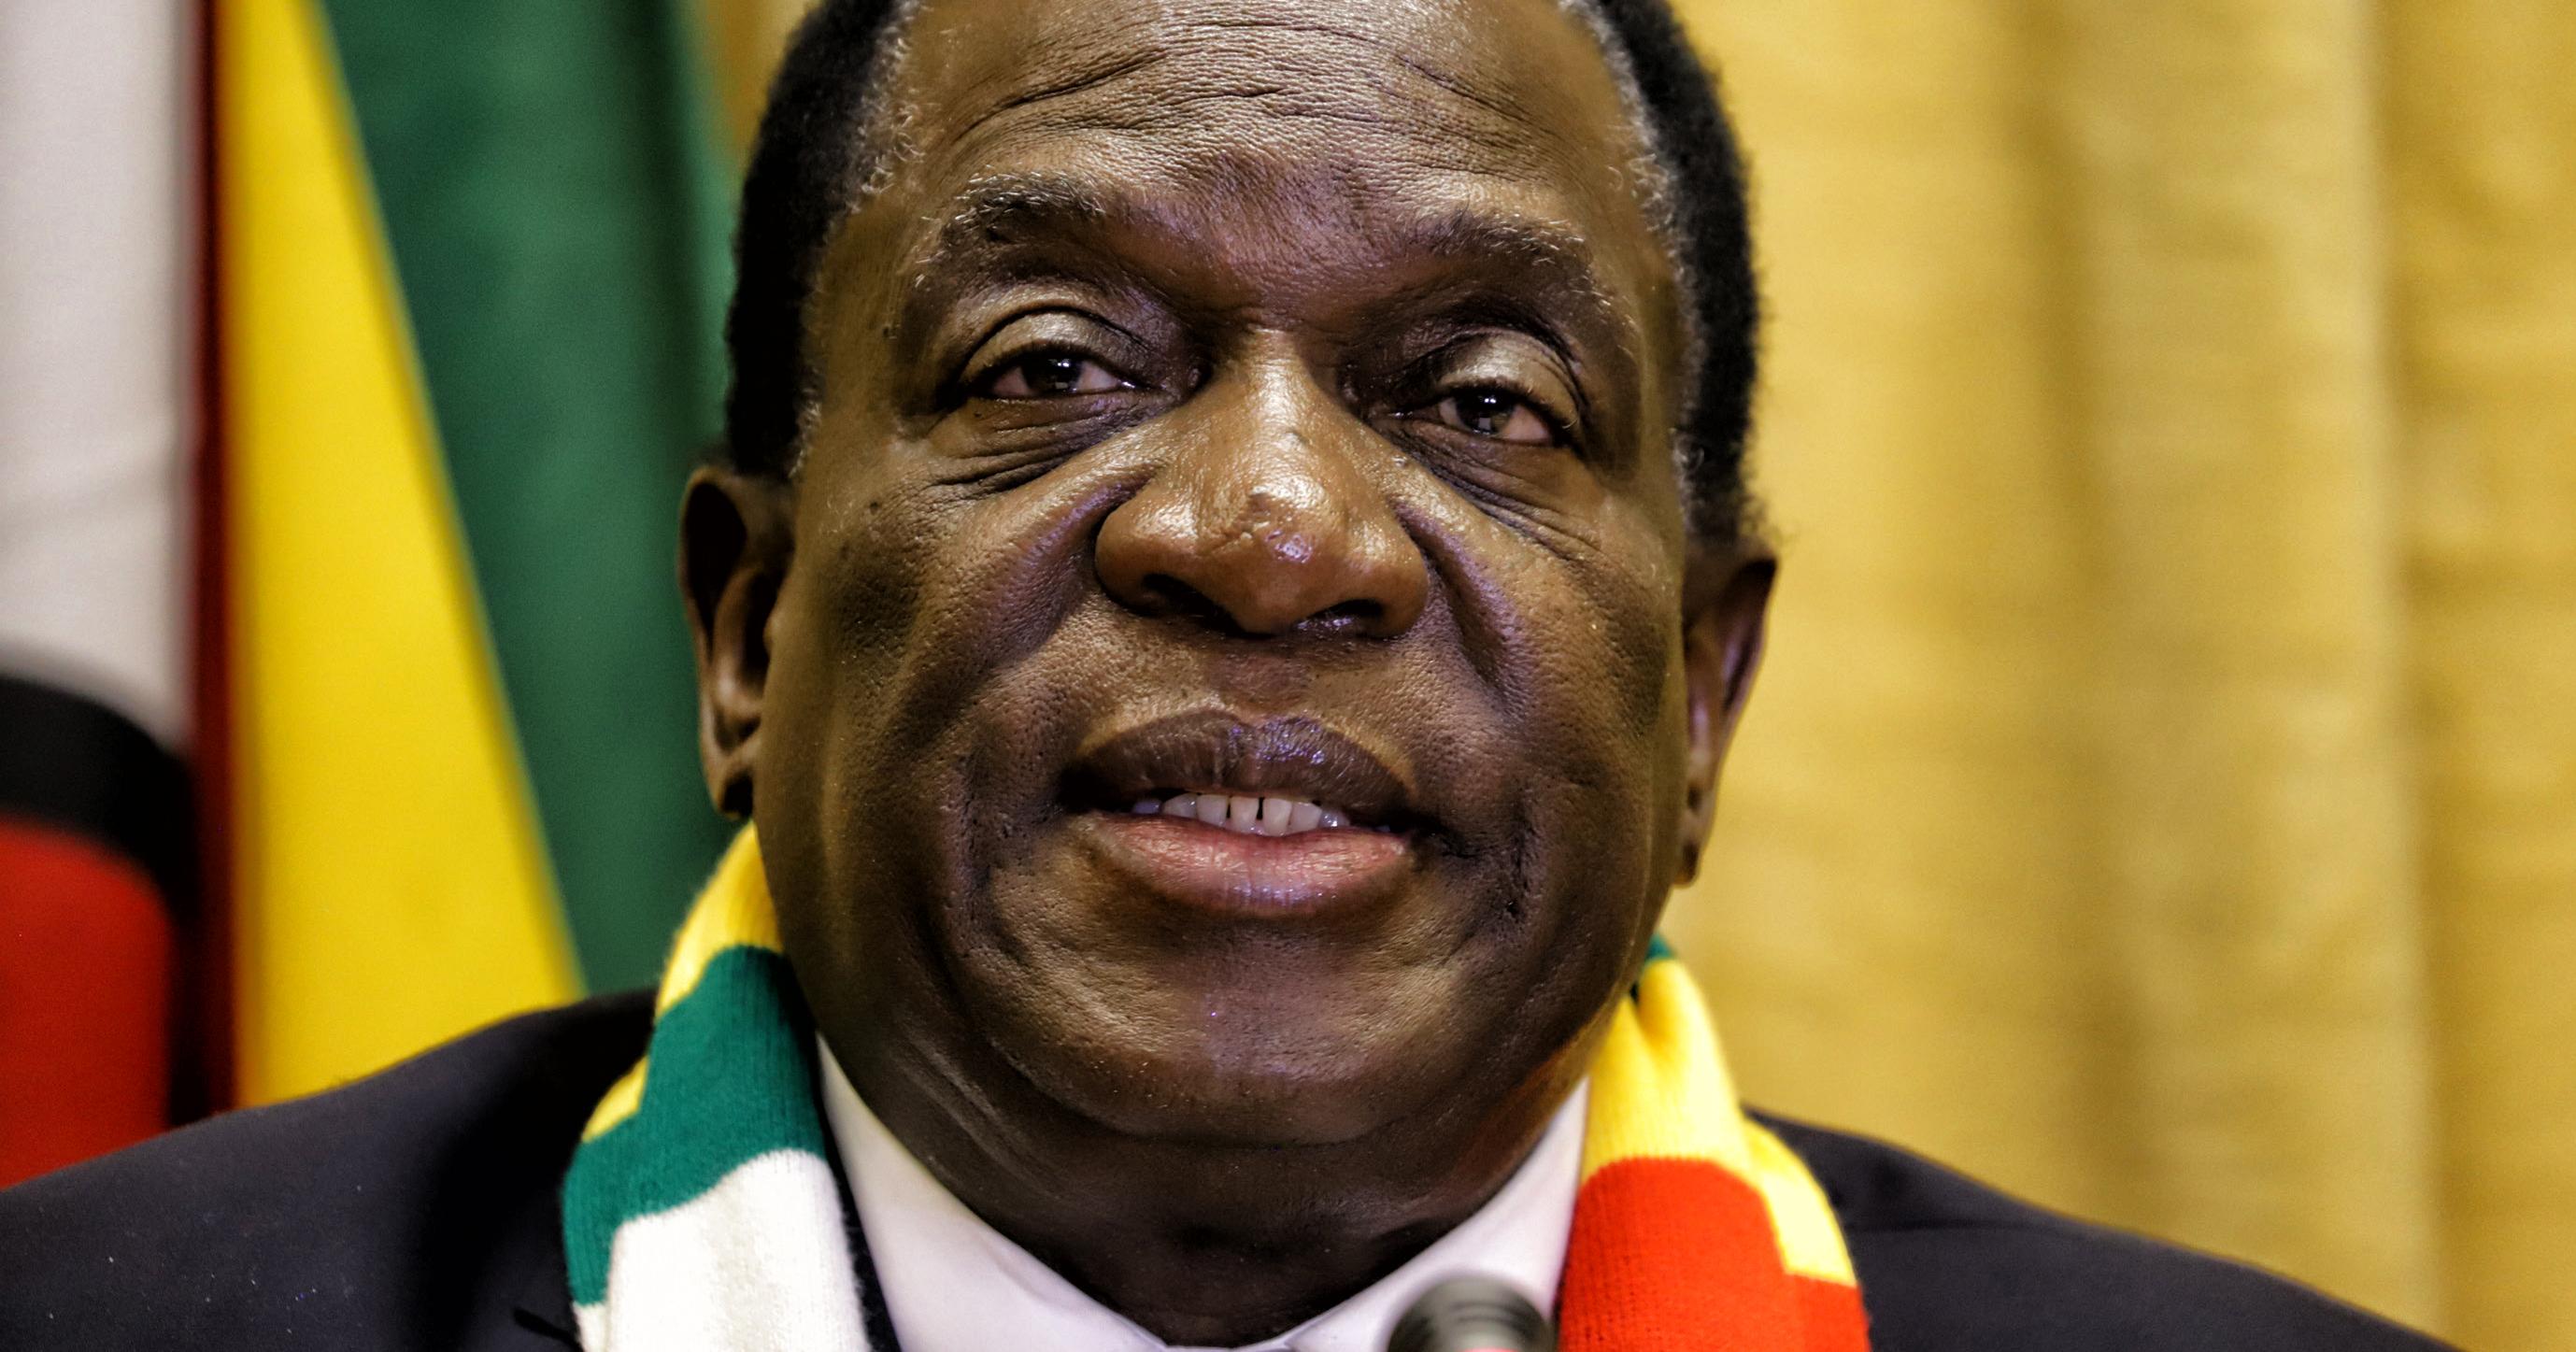 Zimbabwe's (non) human rights are under UN scrutiny